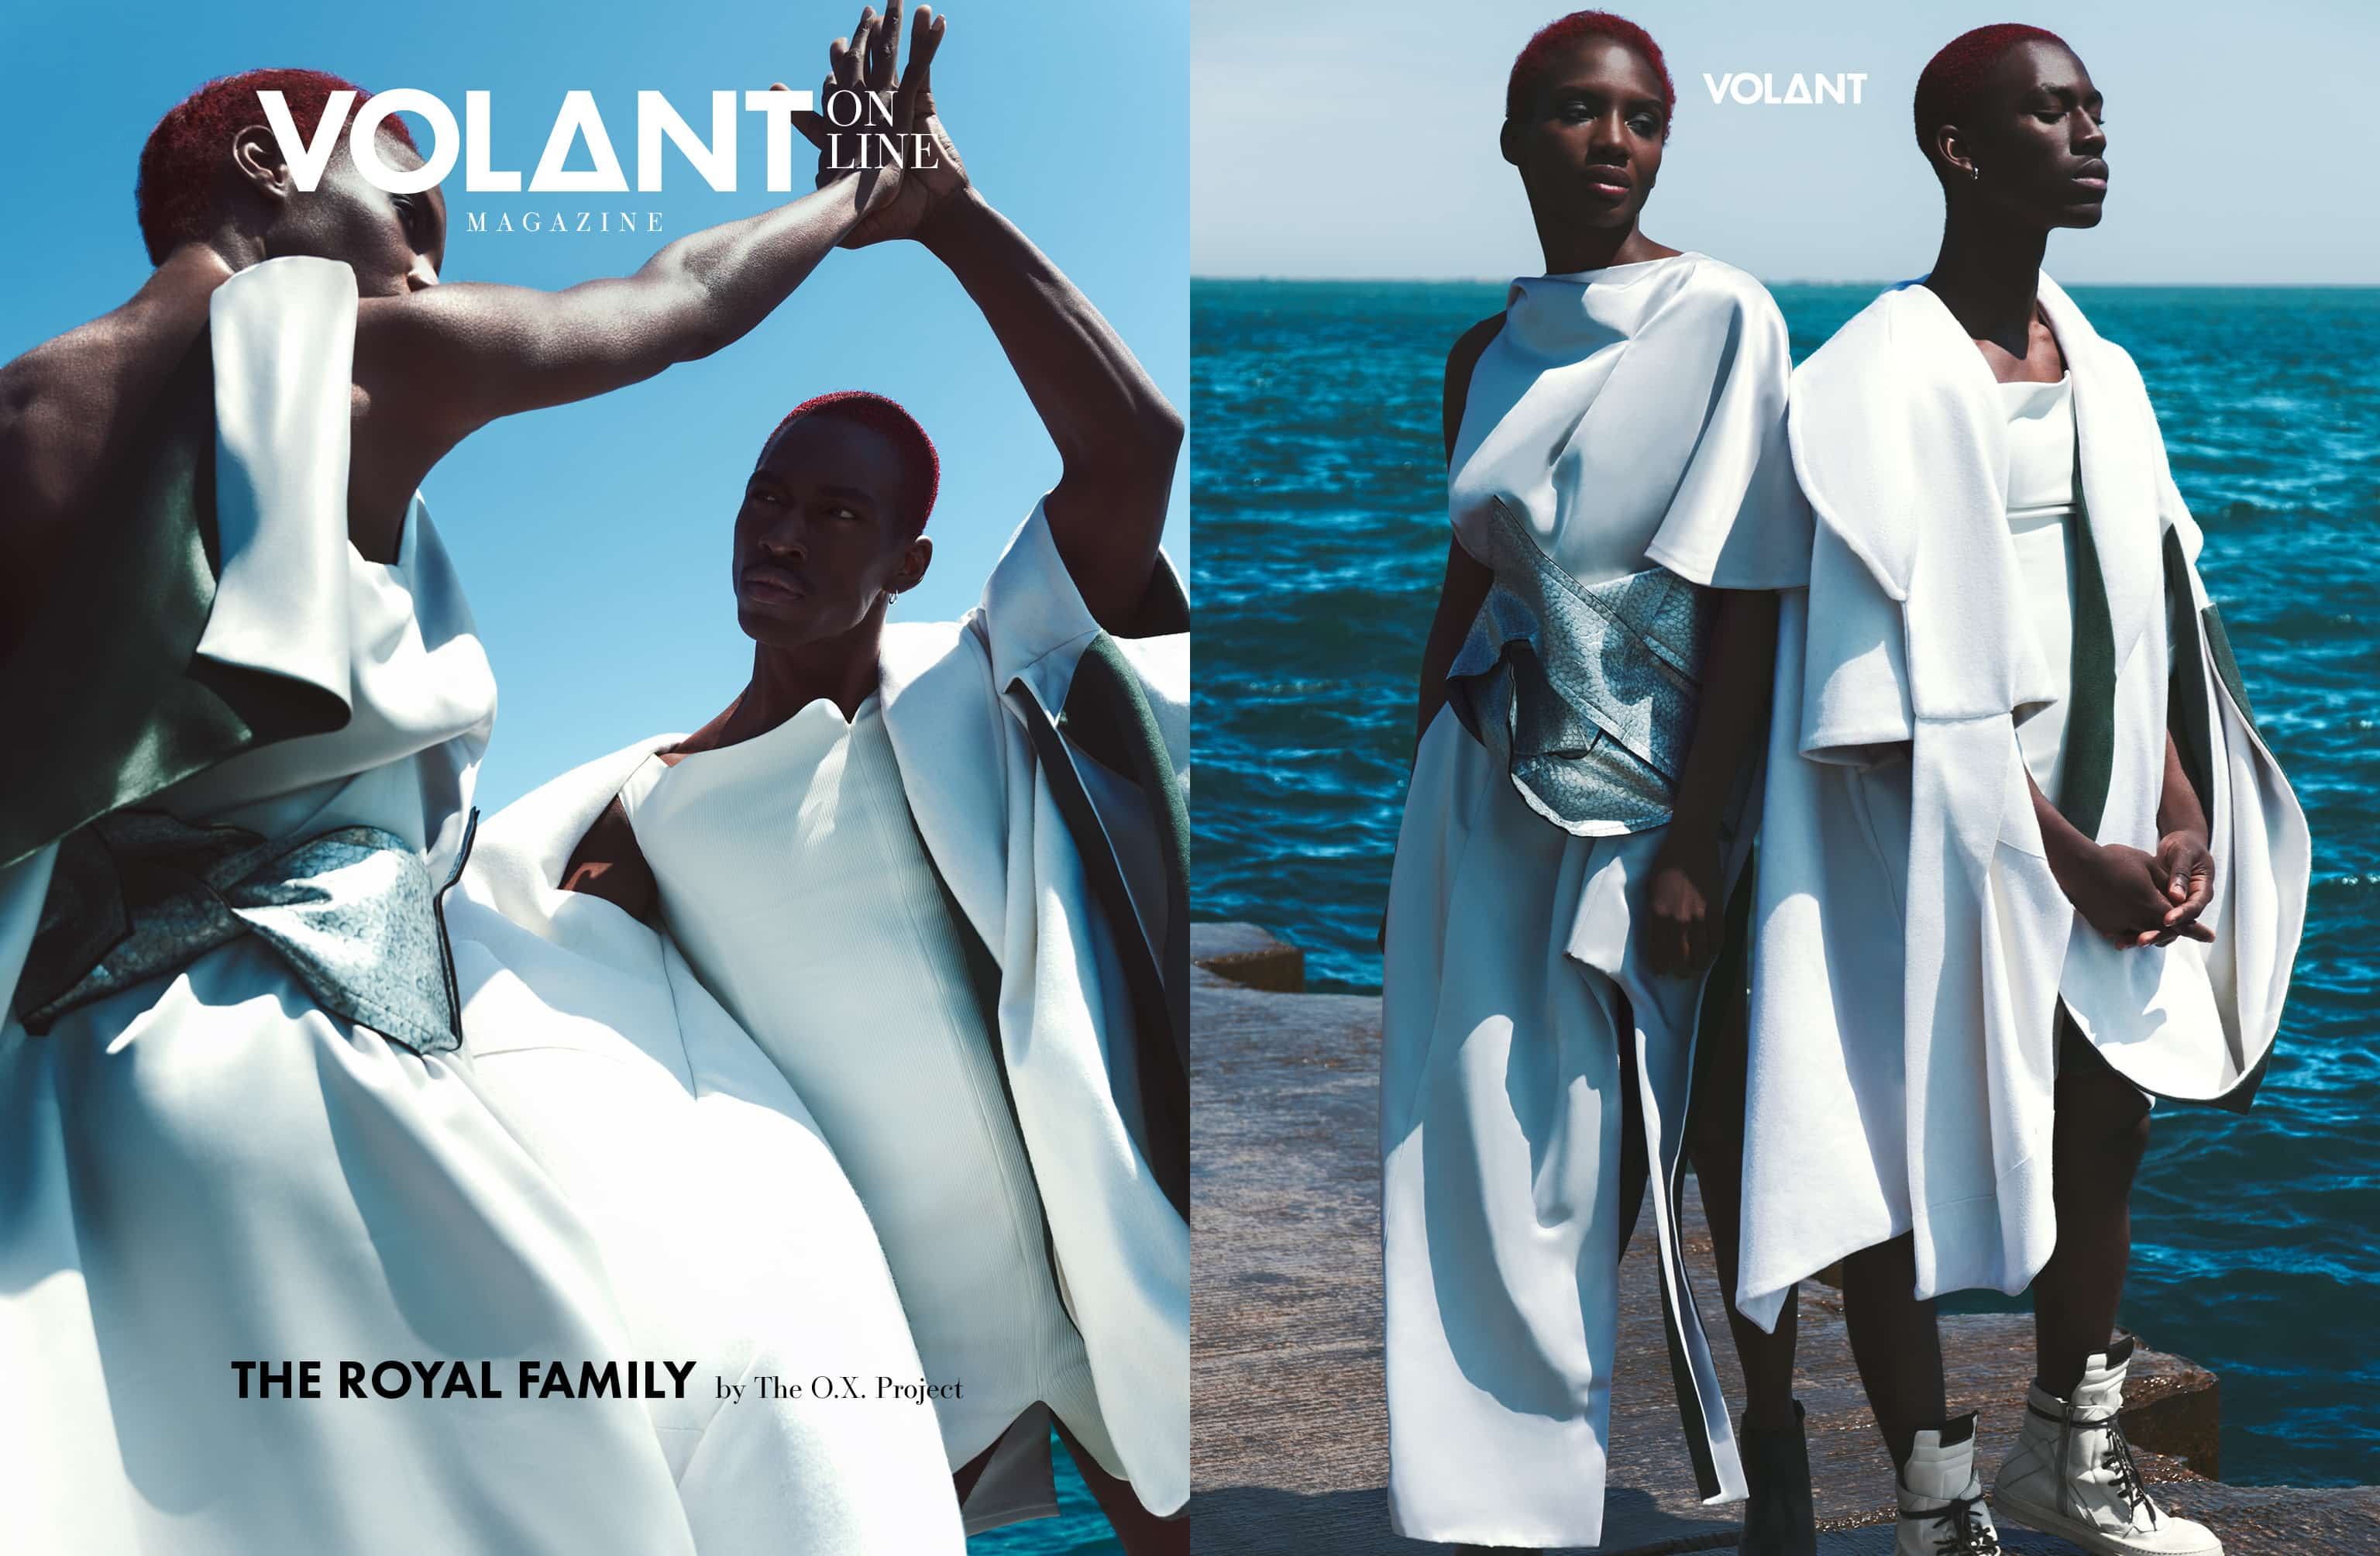 The Royal Family | VOLANT Magazine